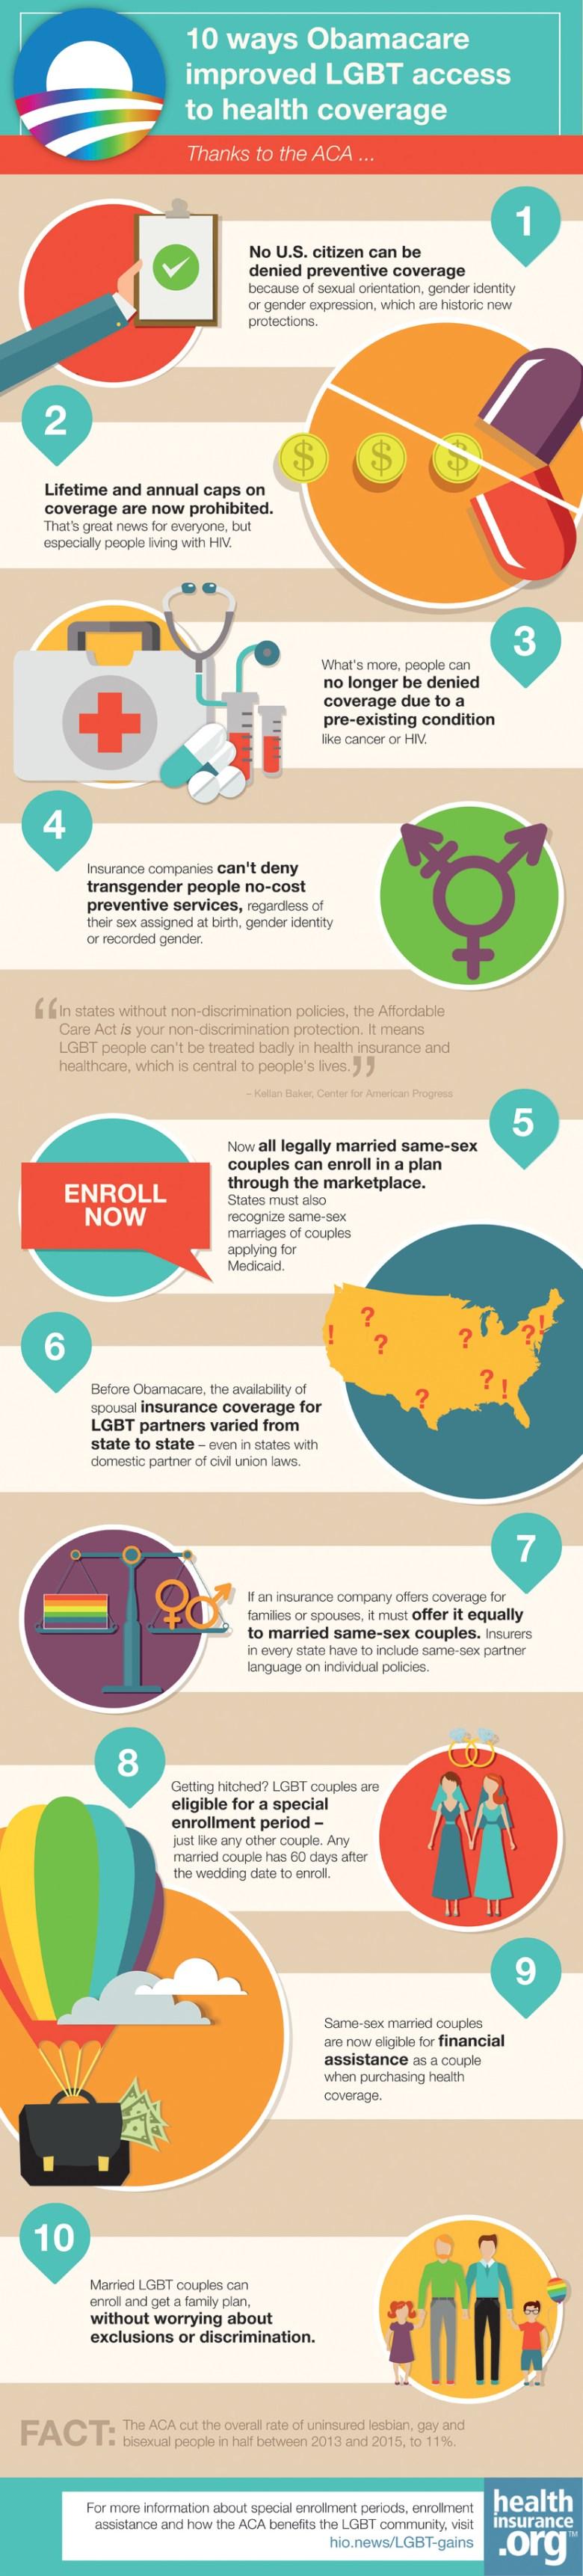 V5.HIO.LGBT.Health.Coverage